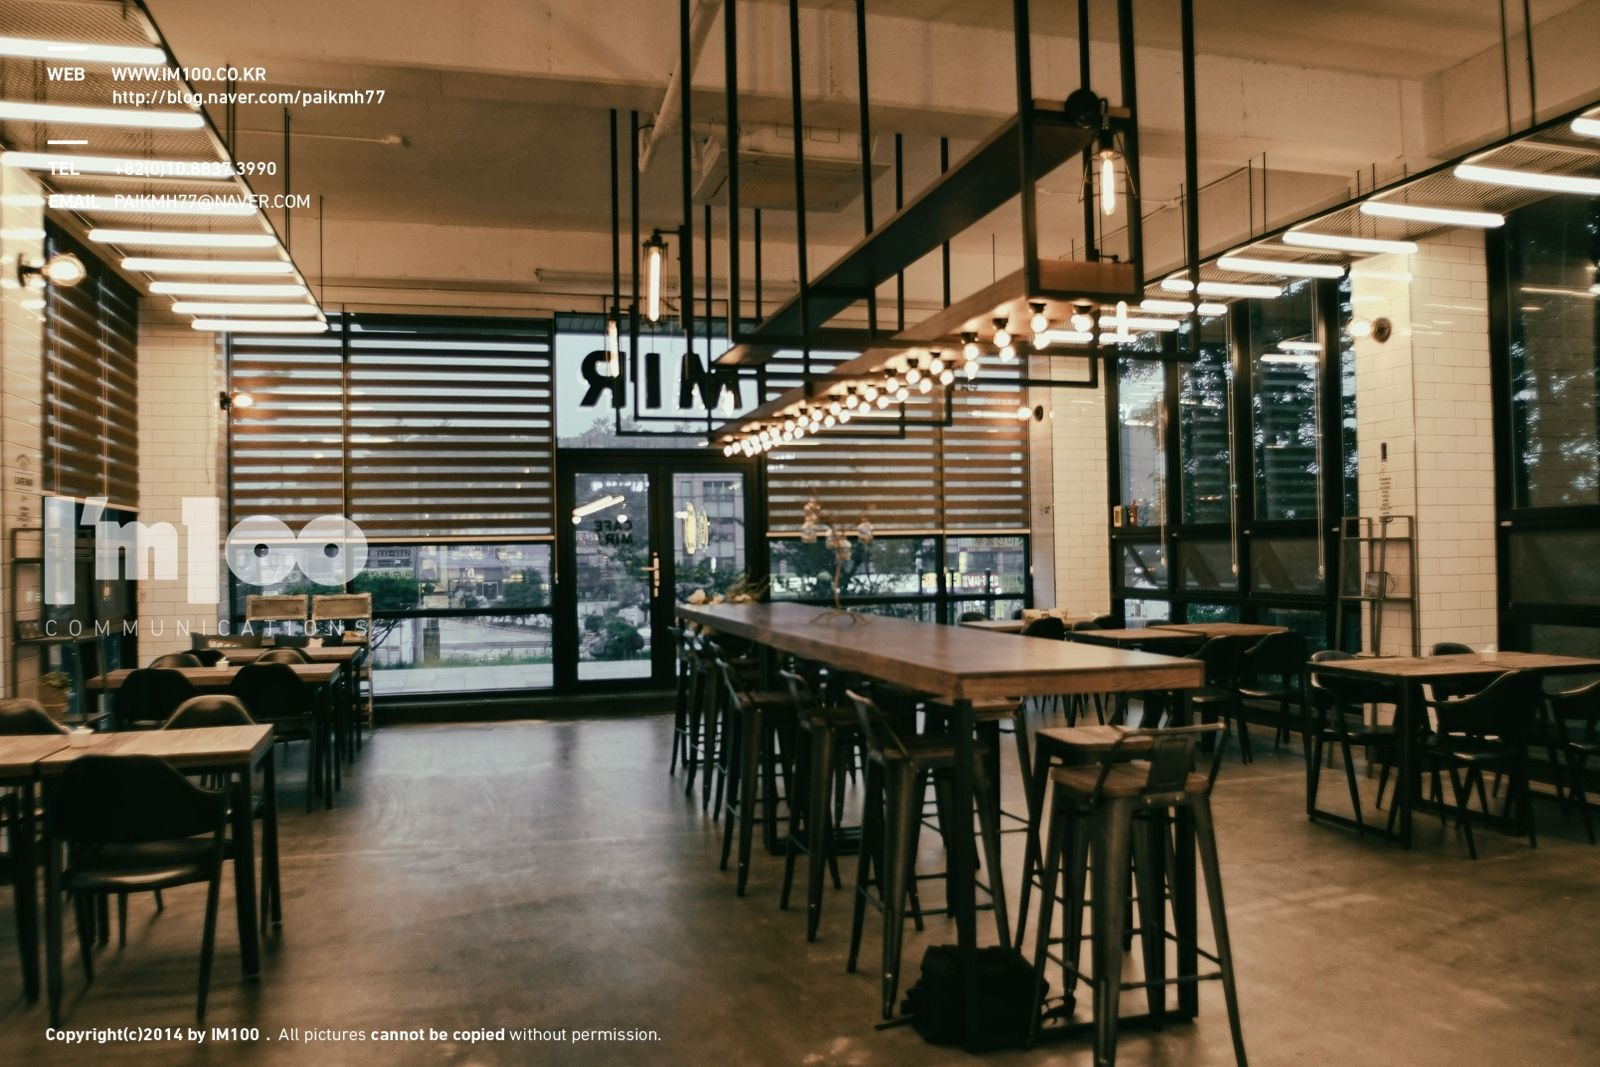 industrial,cafe,interior,branding,카페인테리어,인더스트리얼카페